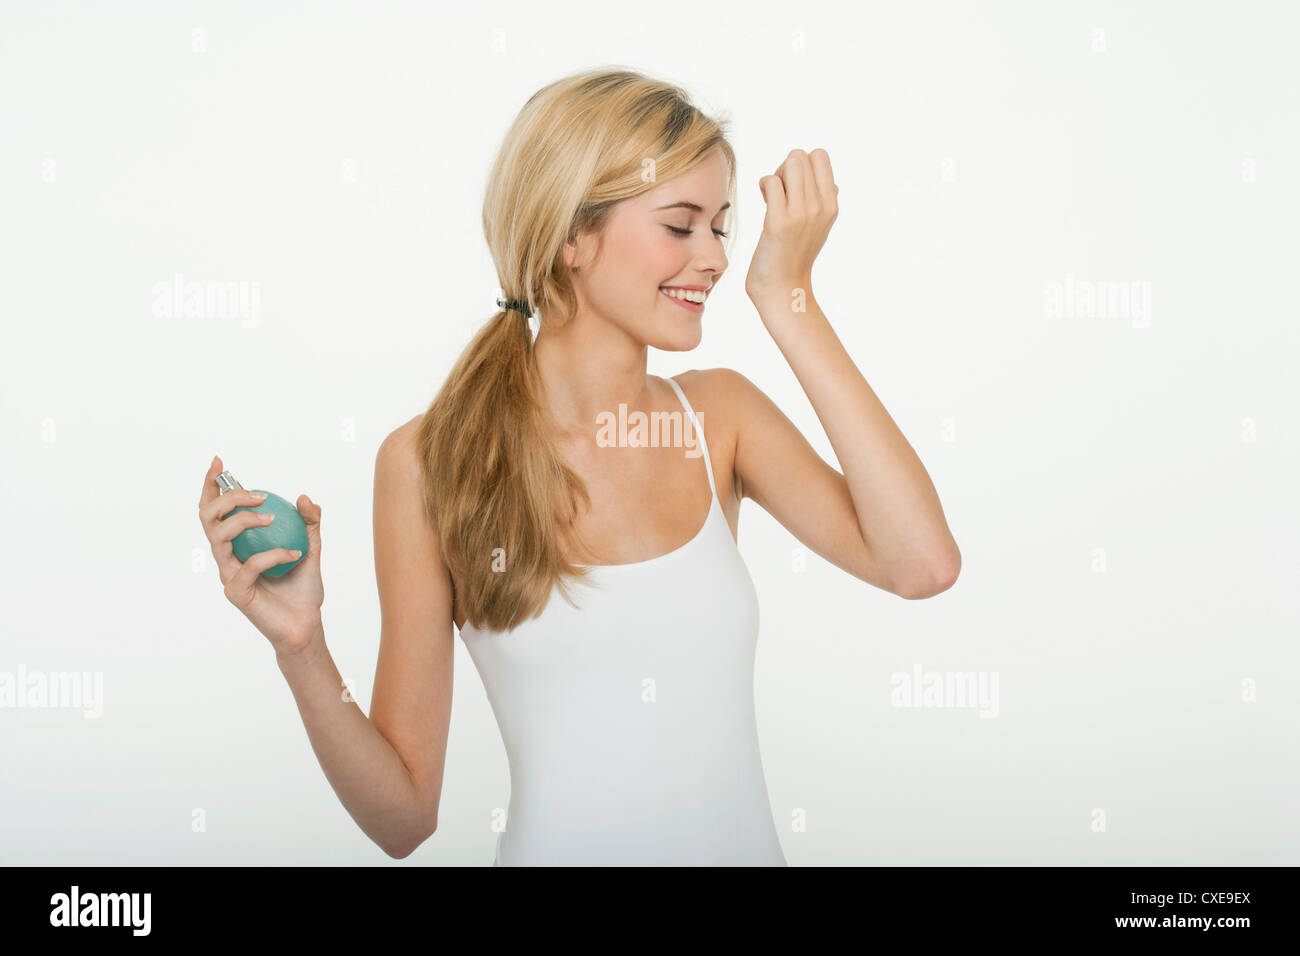 Teen girl smelling perfume - Stock Image